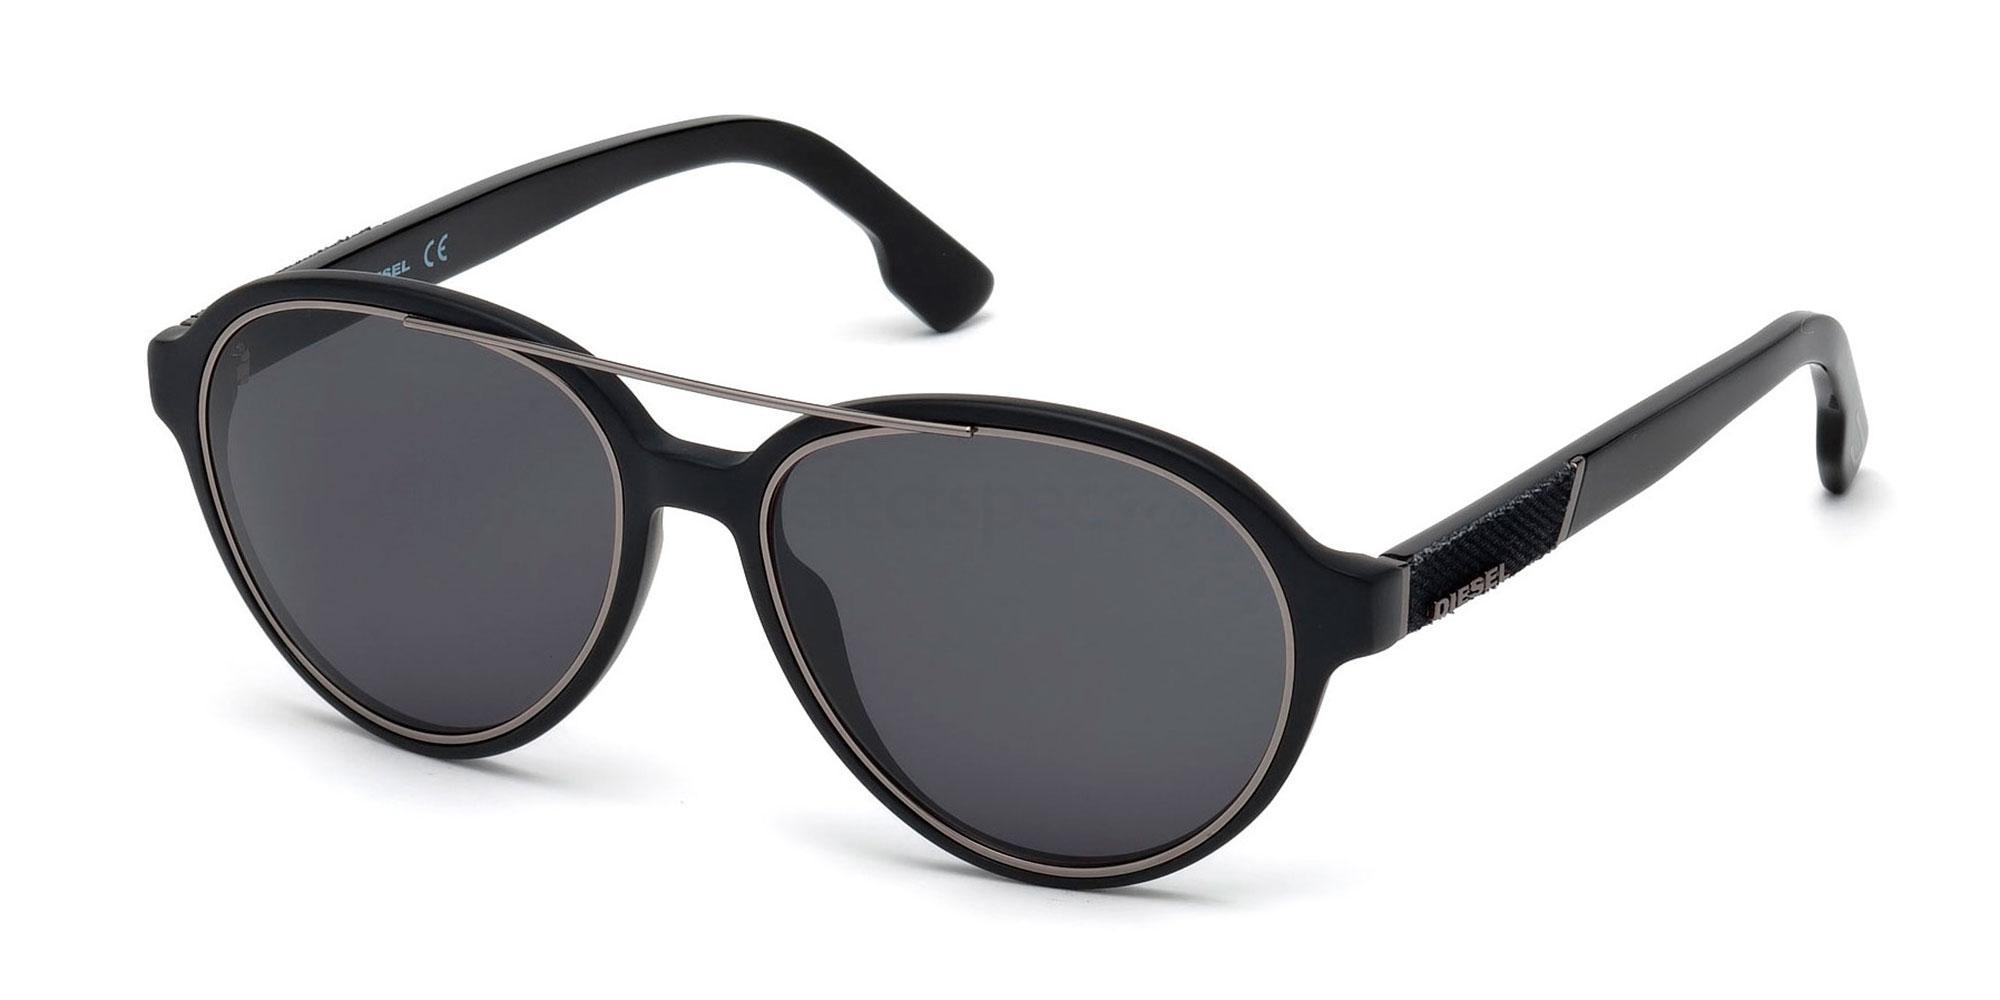 02A DL0214 Sunglasses, Diesel